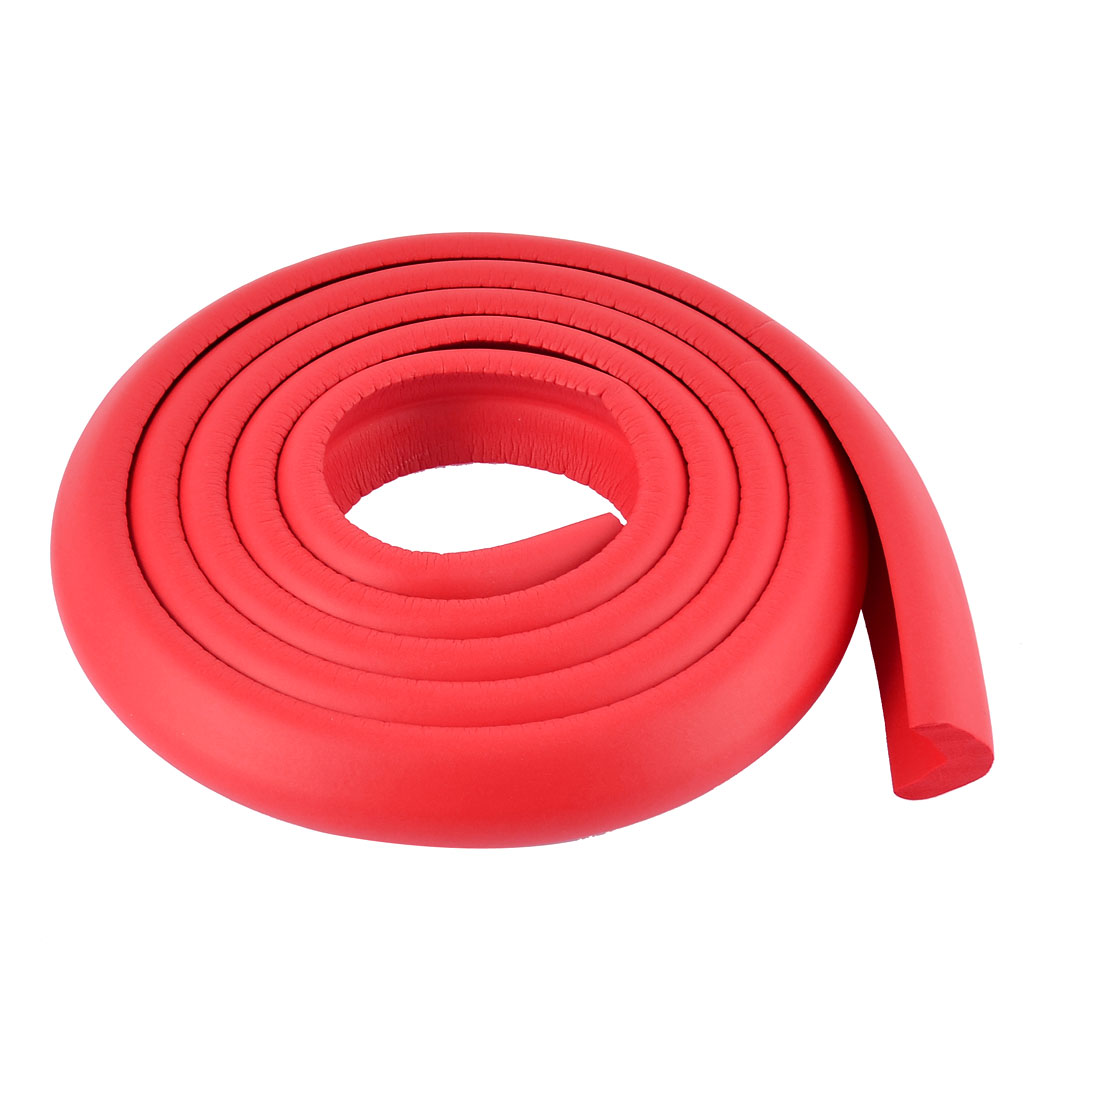 Furniture Table Corner Edge Softner Guard Protector Bumper Cushion Red